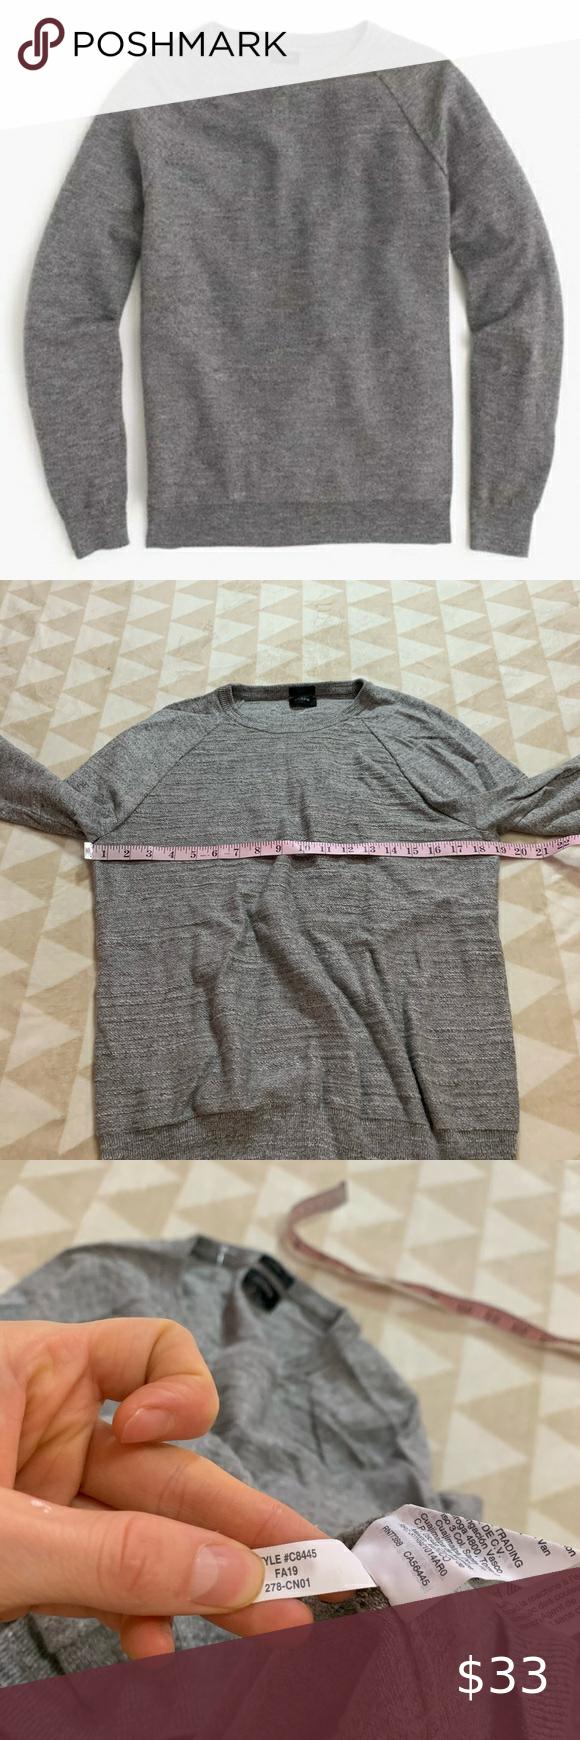 J crew gray rugged cotton sweater slim crewneck J